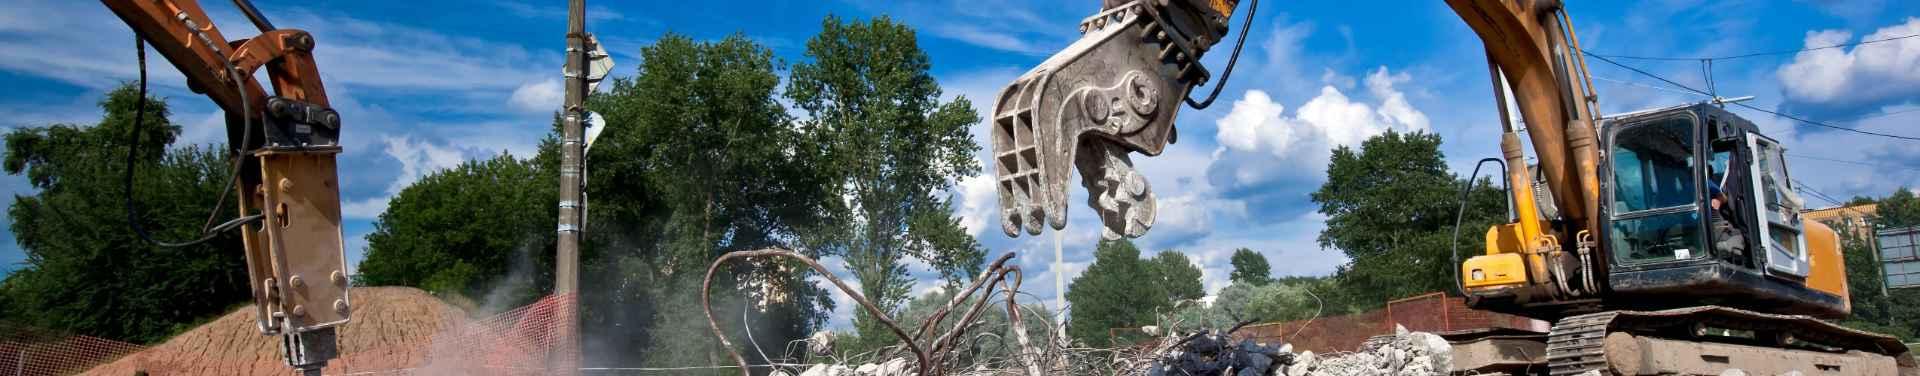 Demolition Equipment - Big Easy Demolition